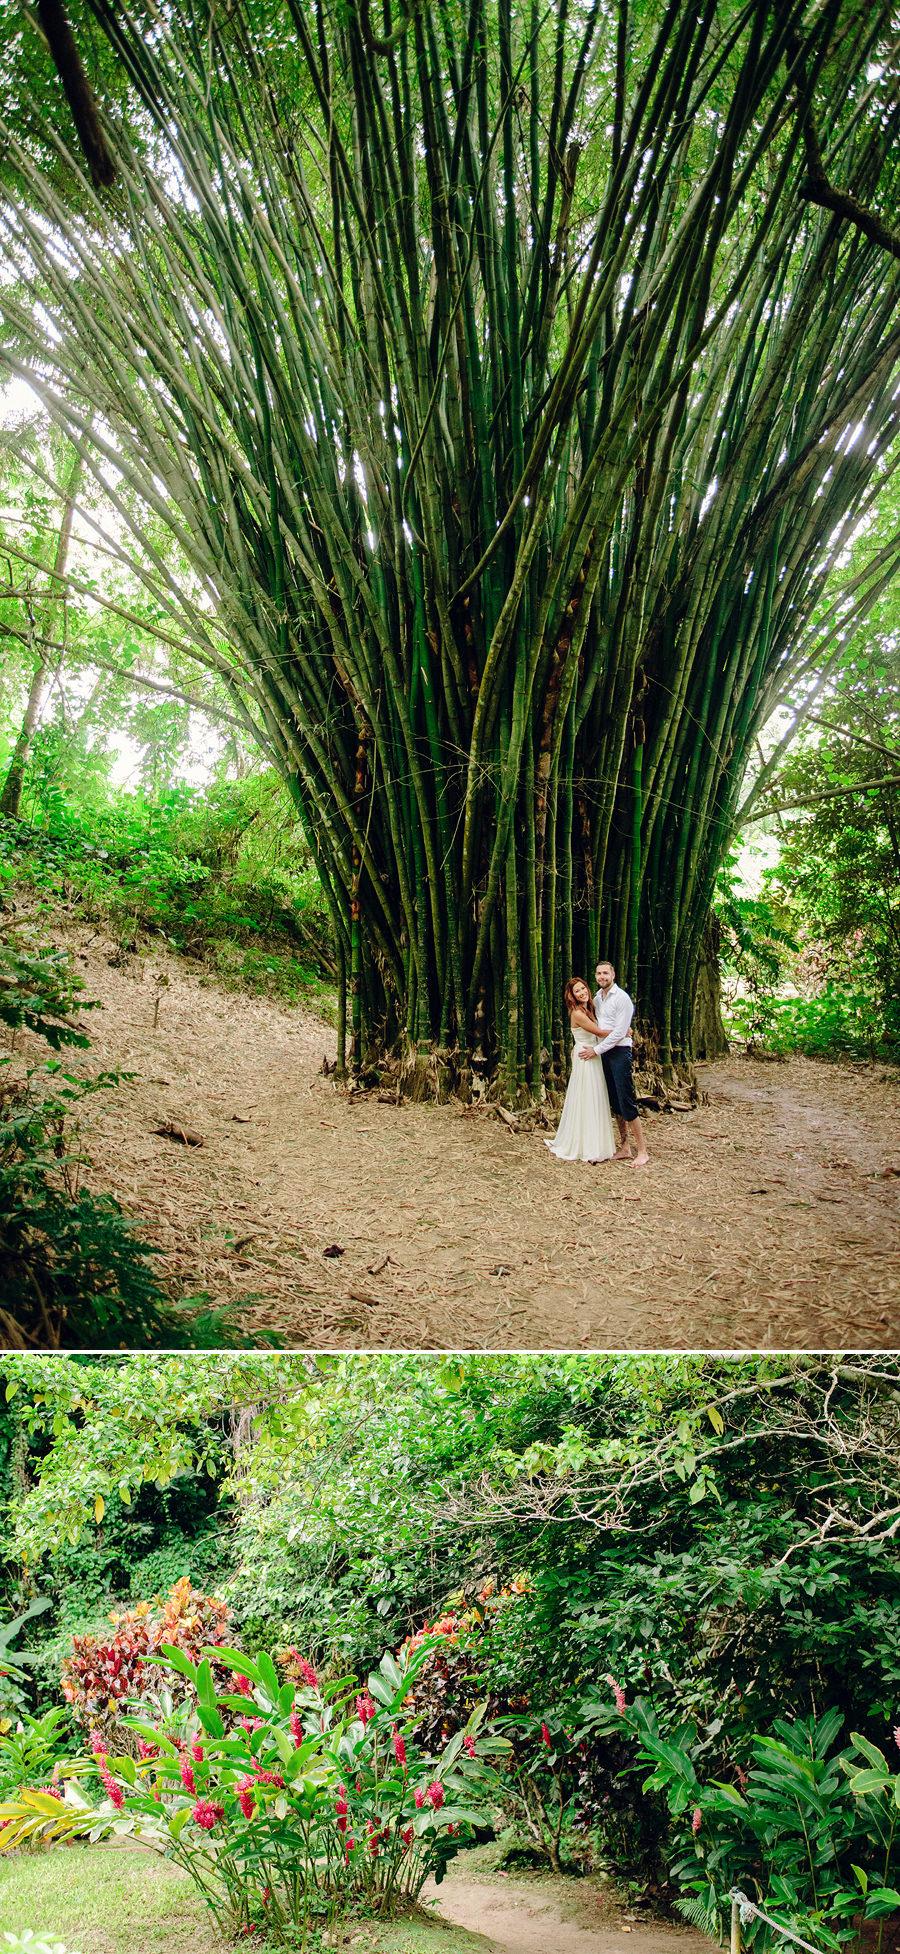 Mele Cascades Vanuatu Wedding Photographer: Bamboo